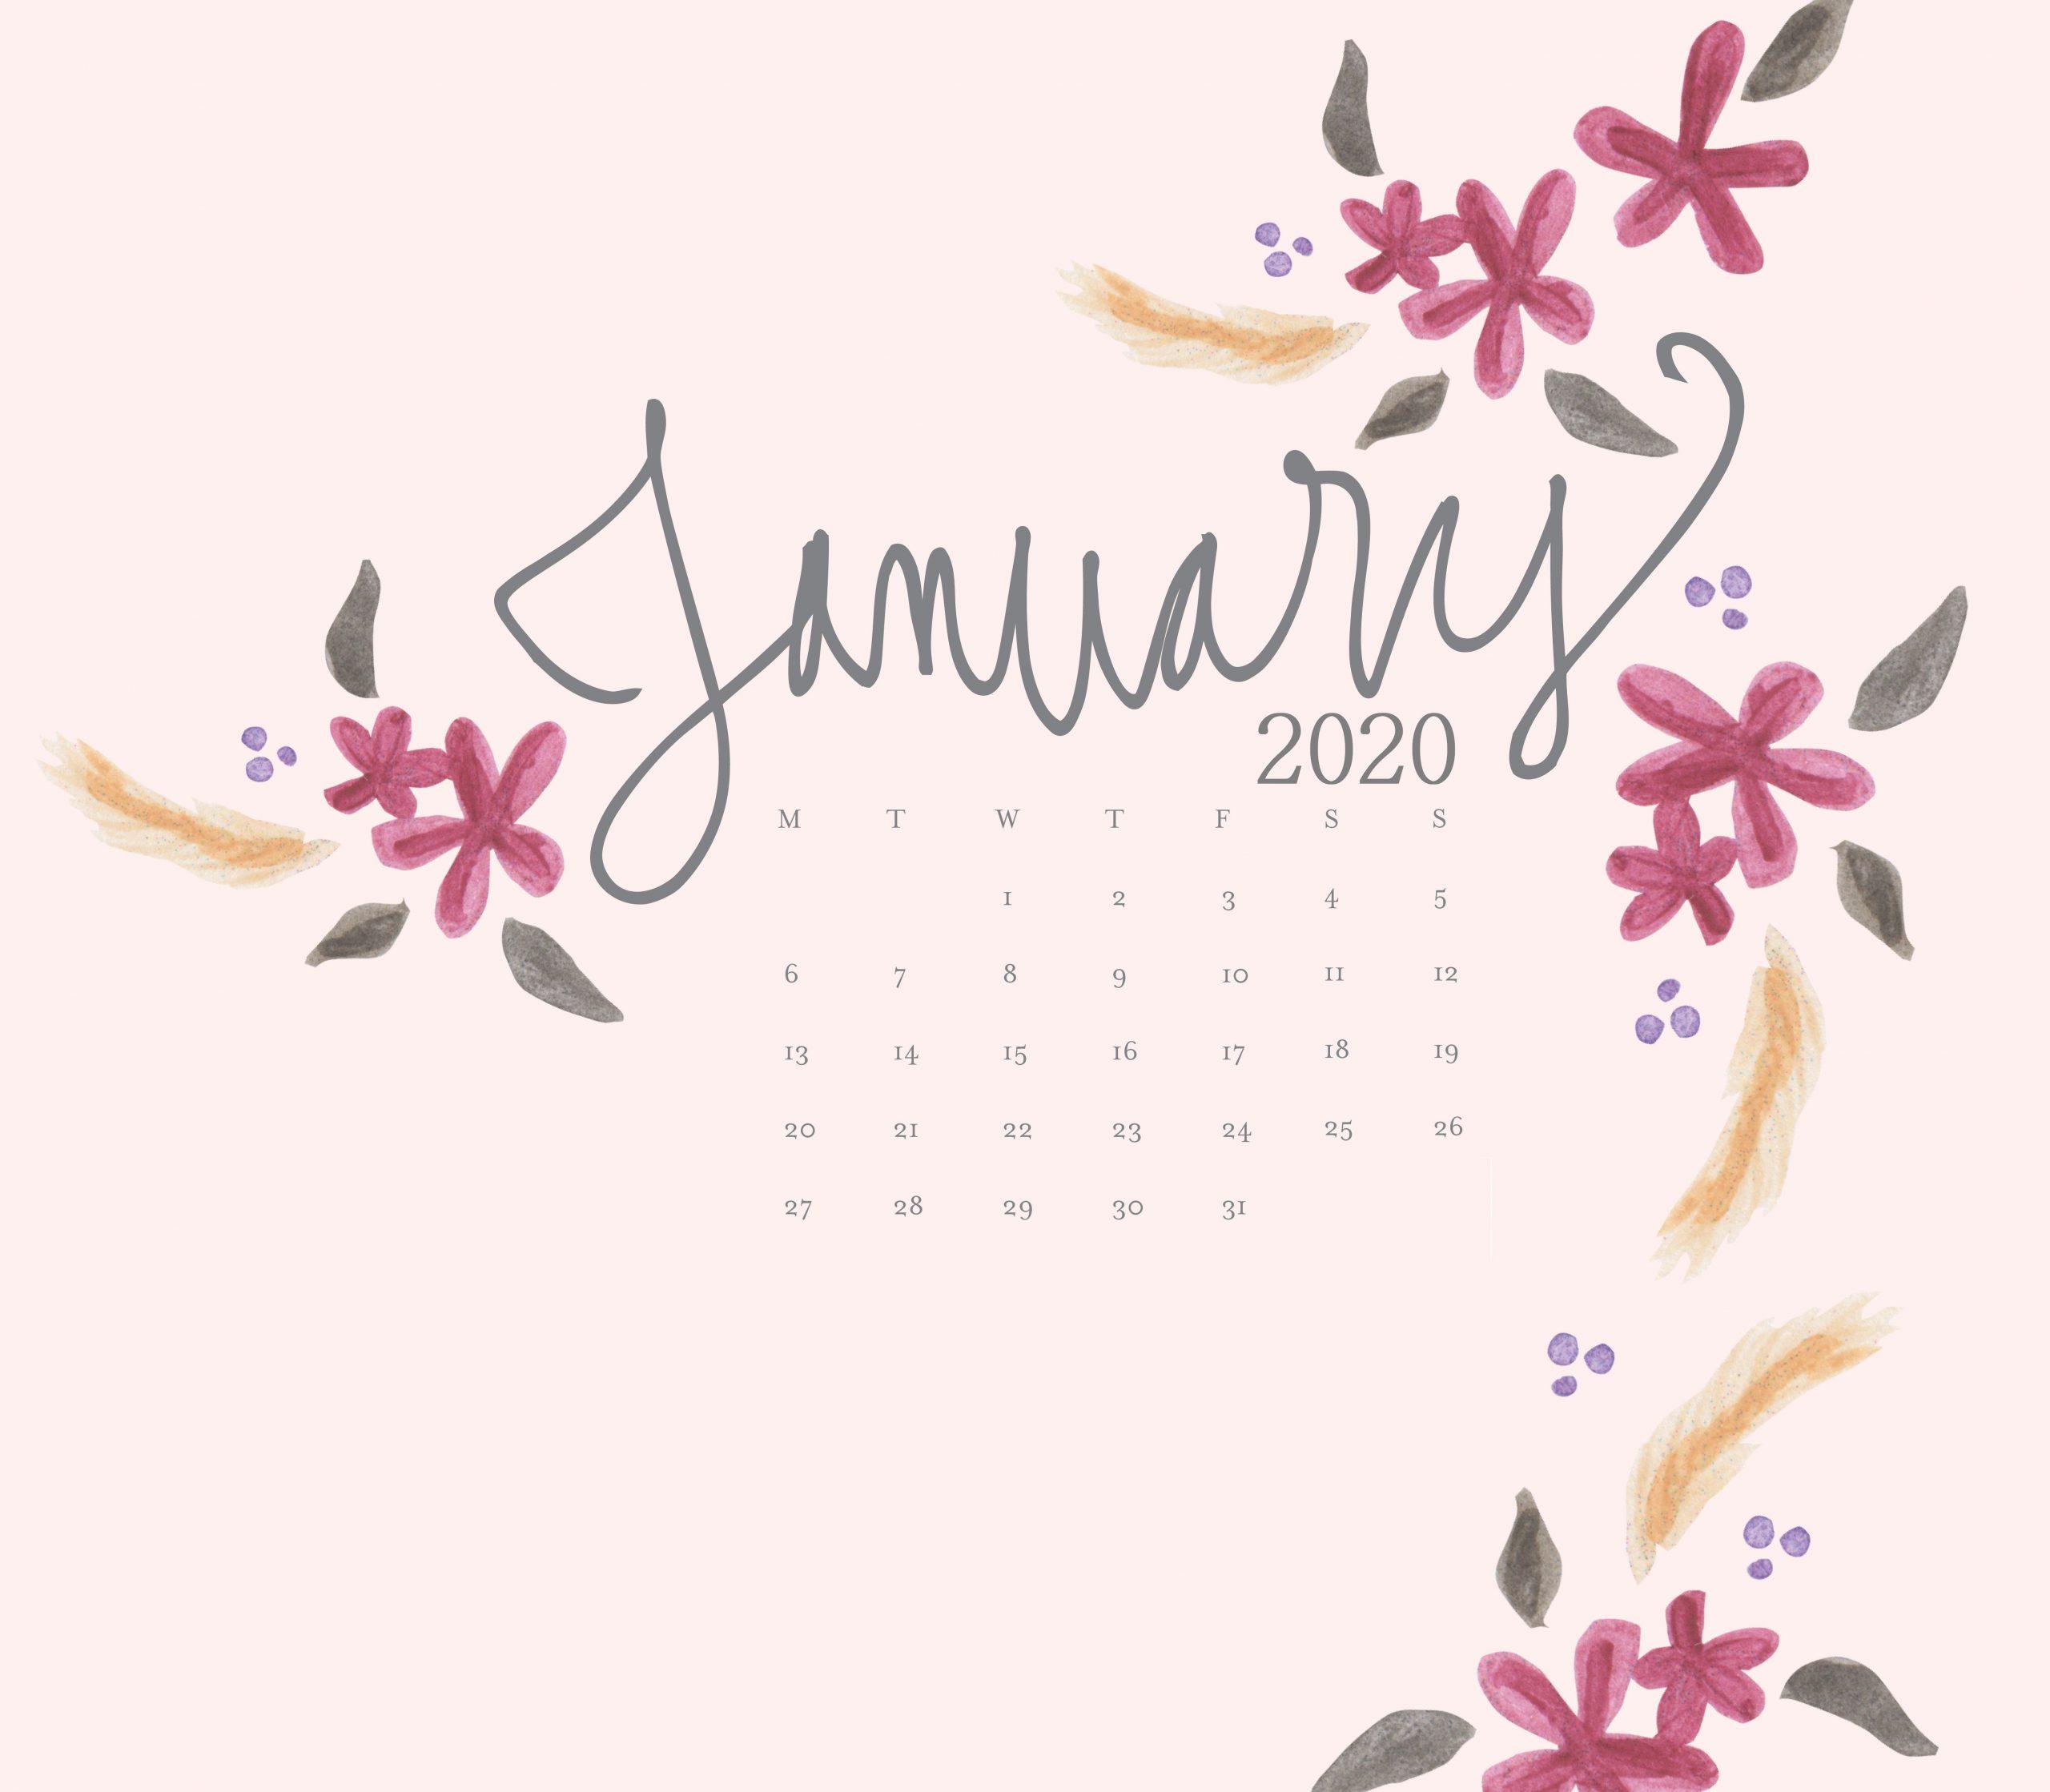 download January 2020 Desktop Calendar Wallpaper Max 2560x2238